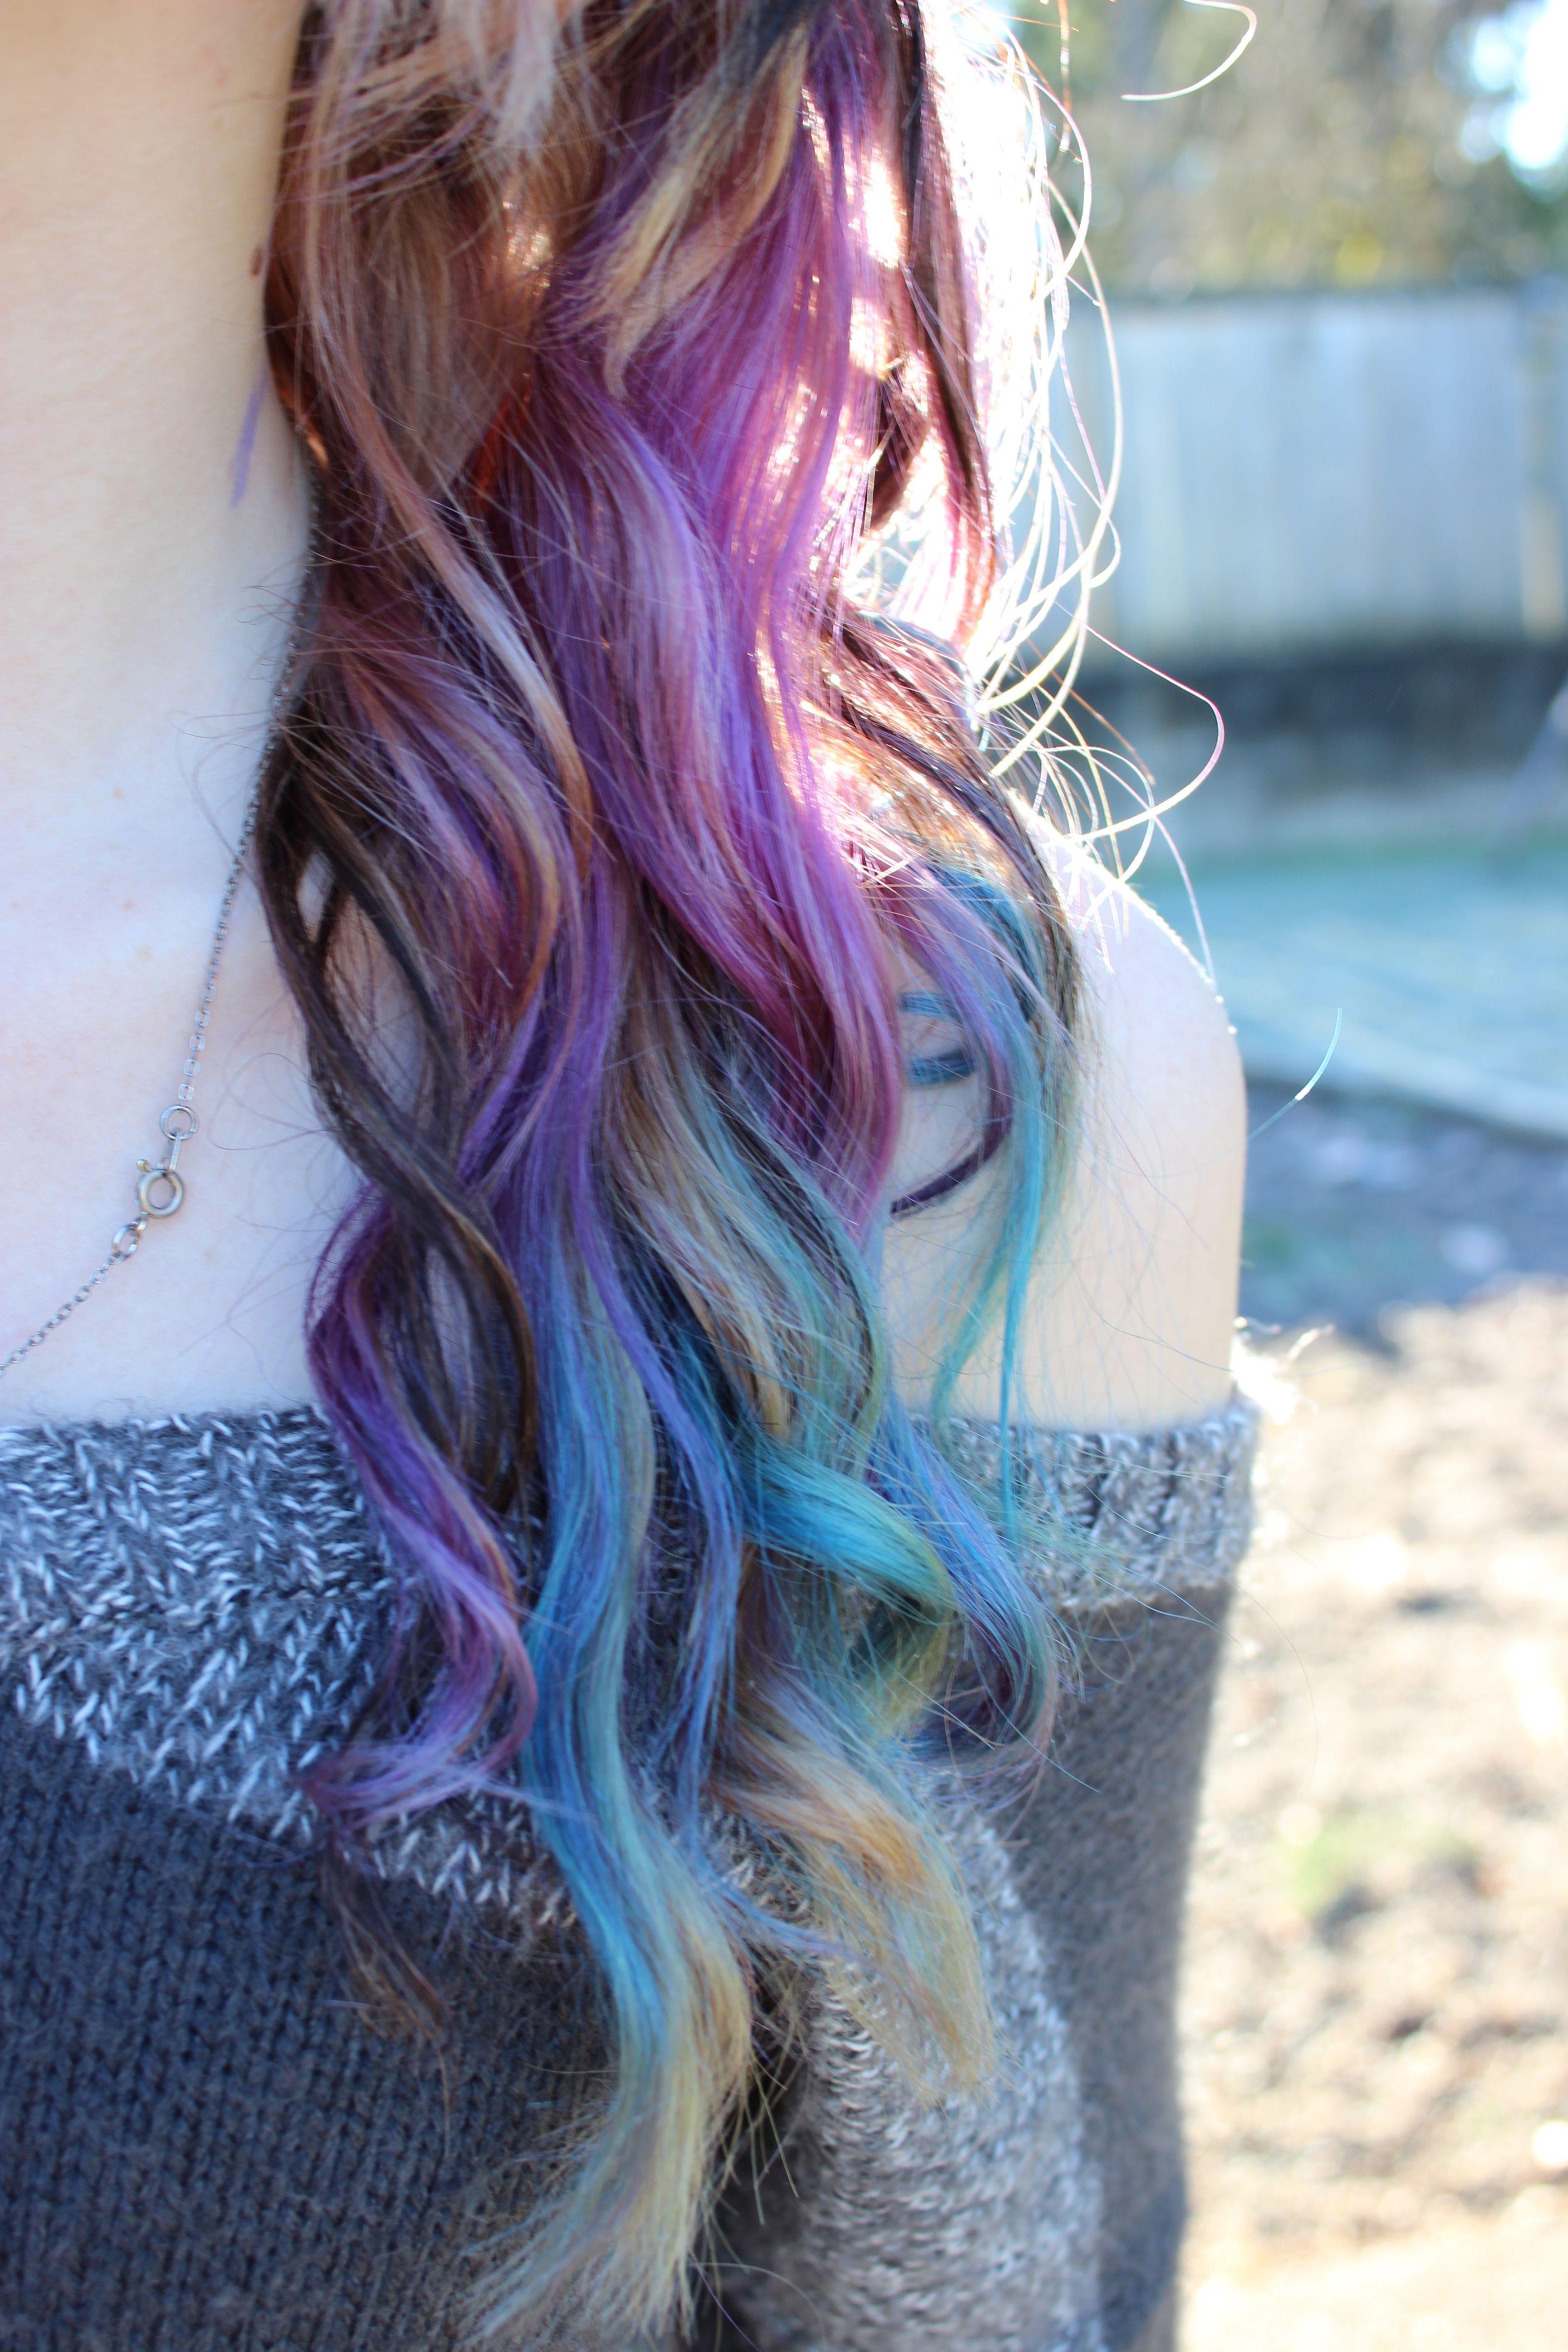 purple, teal and blonde hair, colorful hair, rainbow hair ...